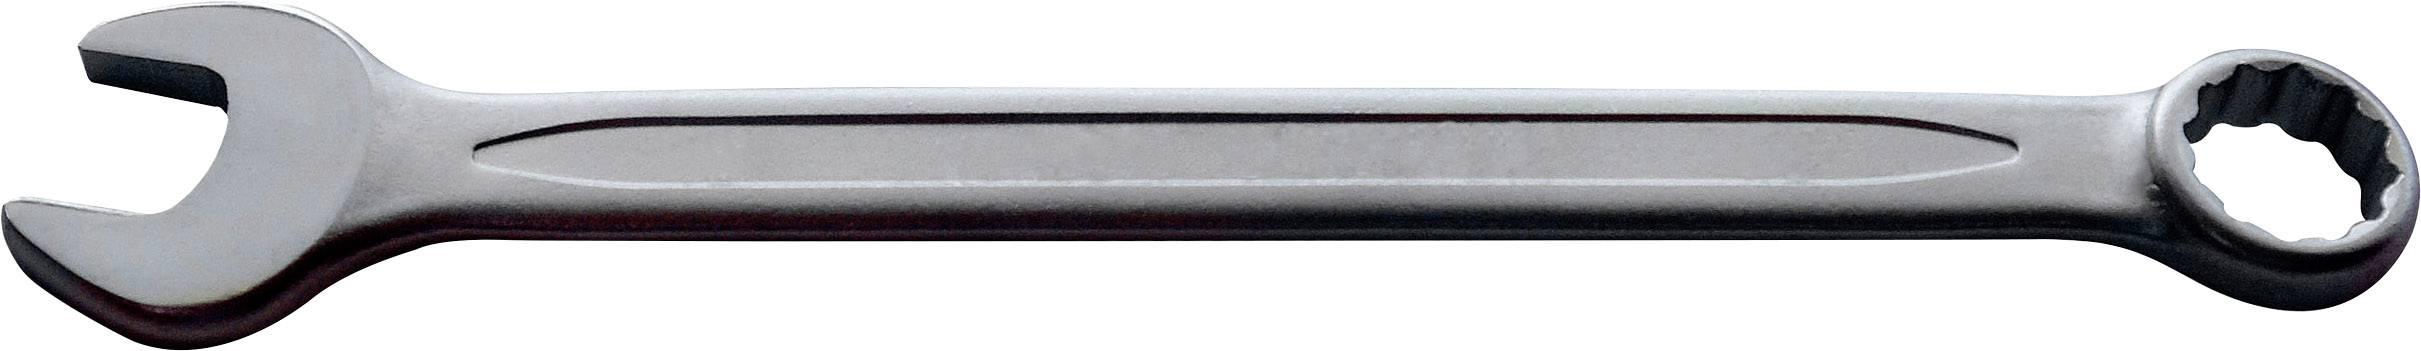 Očkoplochý kľúč/e TOOLCRAFT 820833, 9 mm